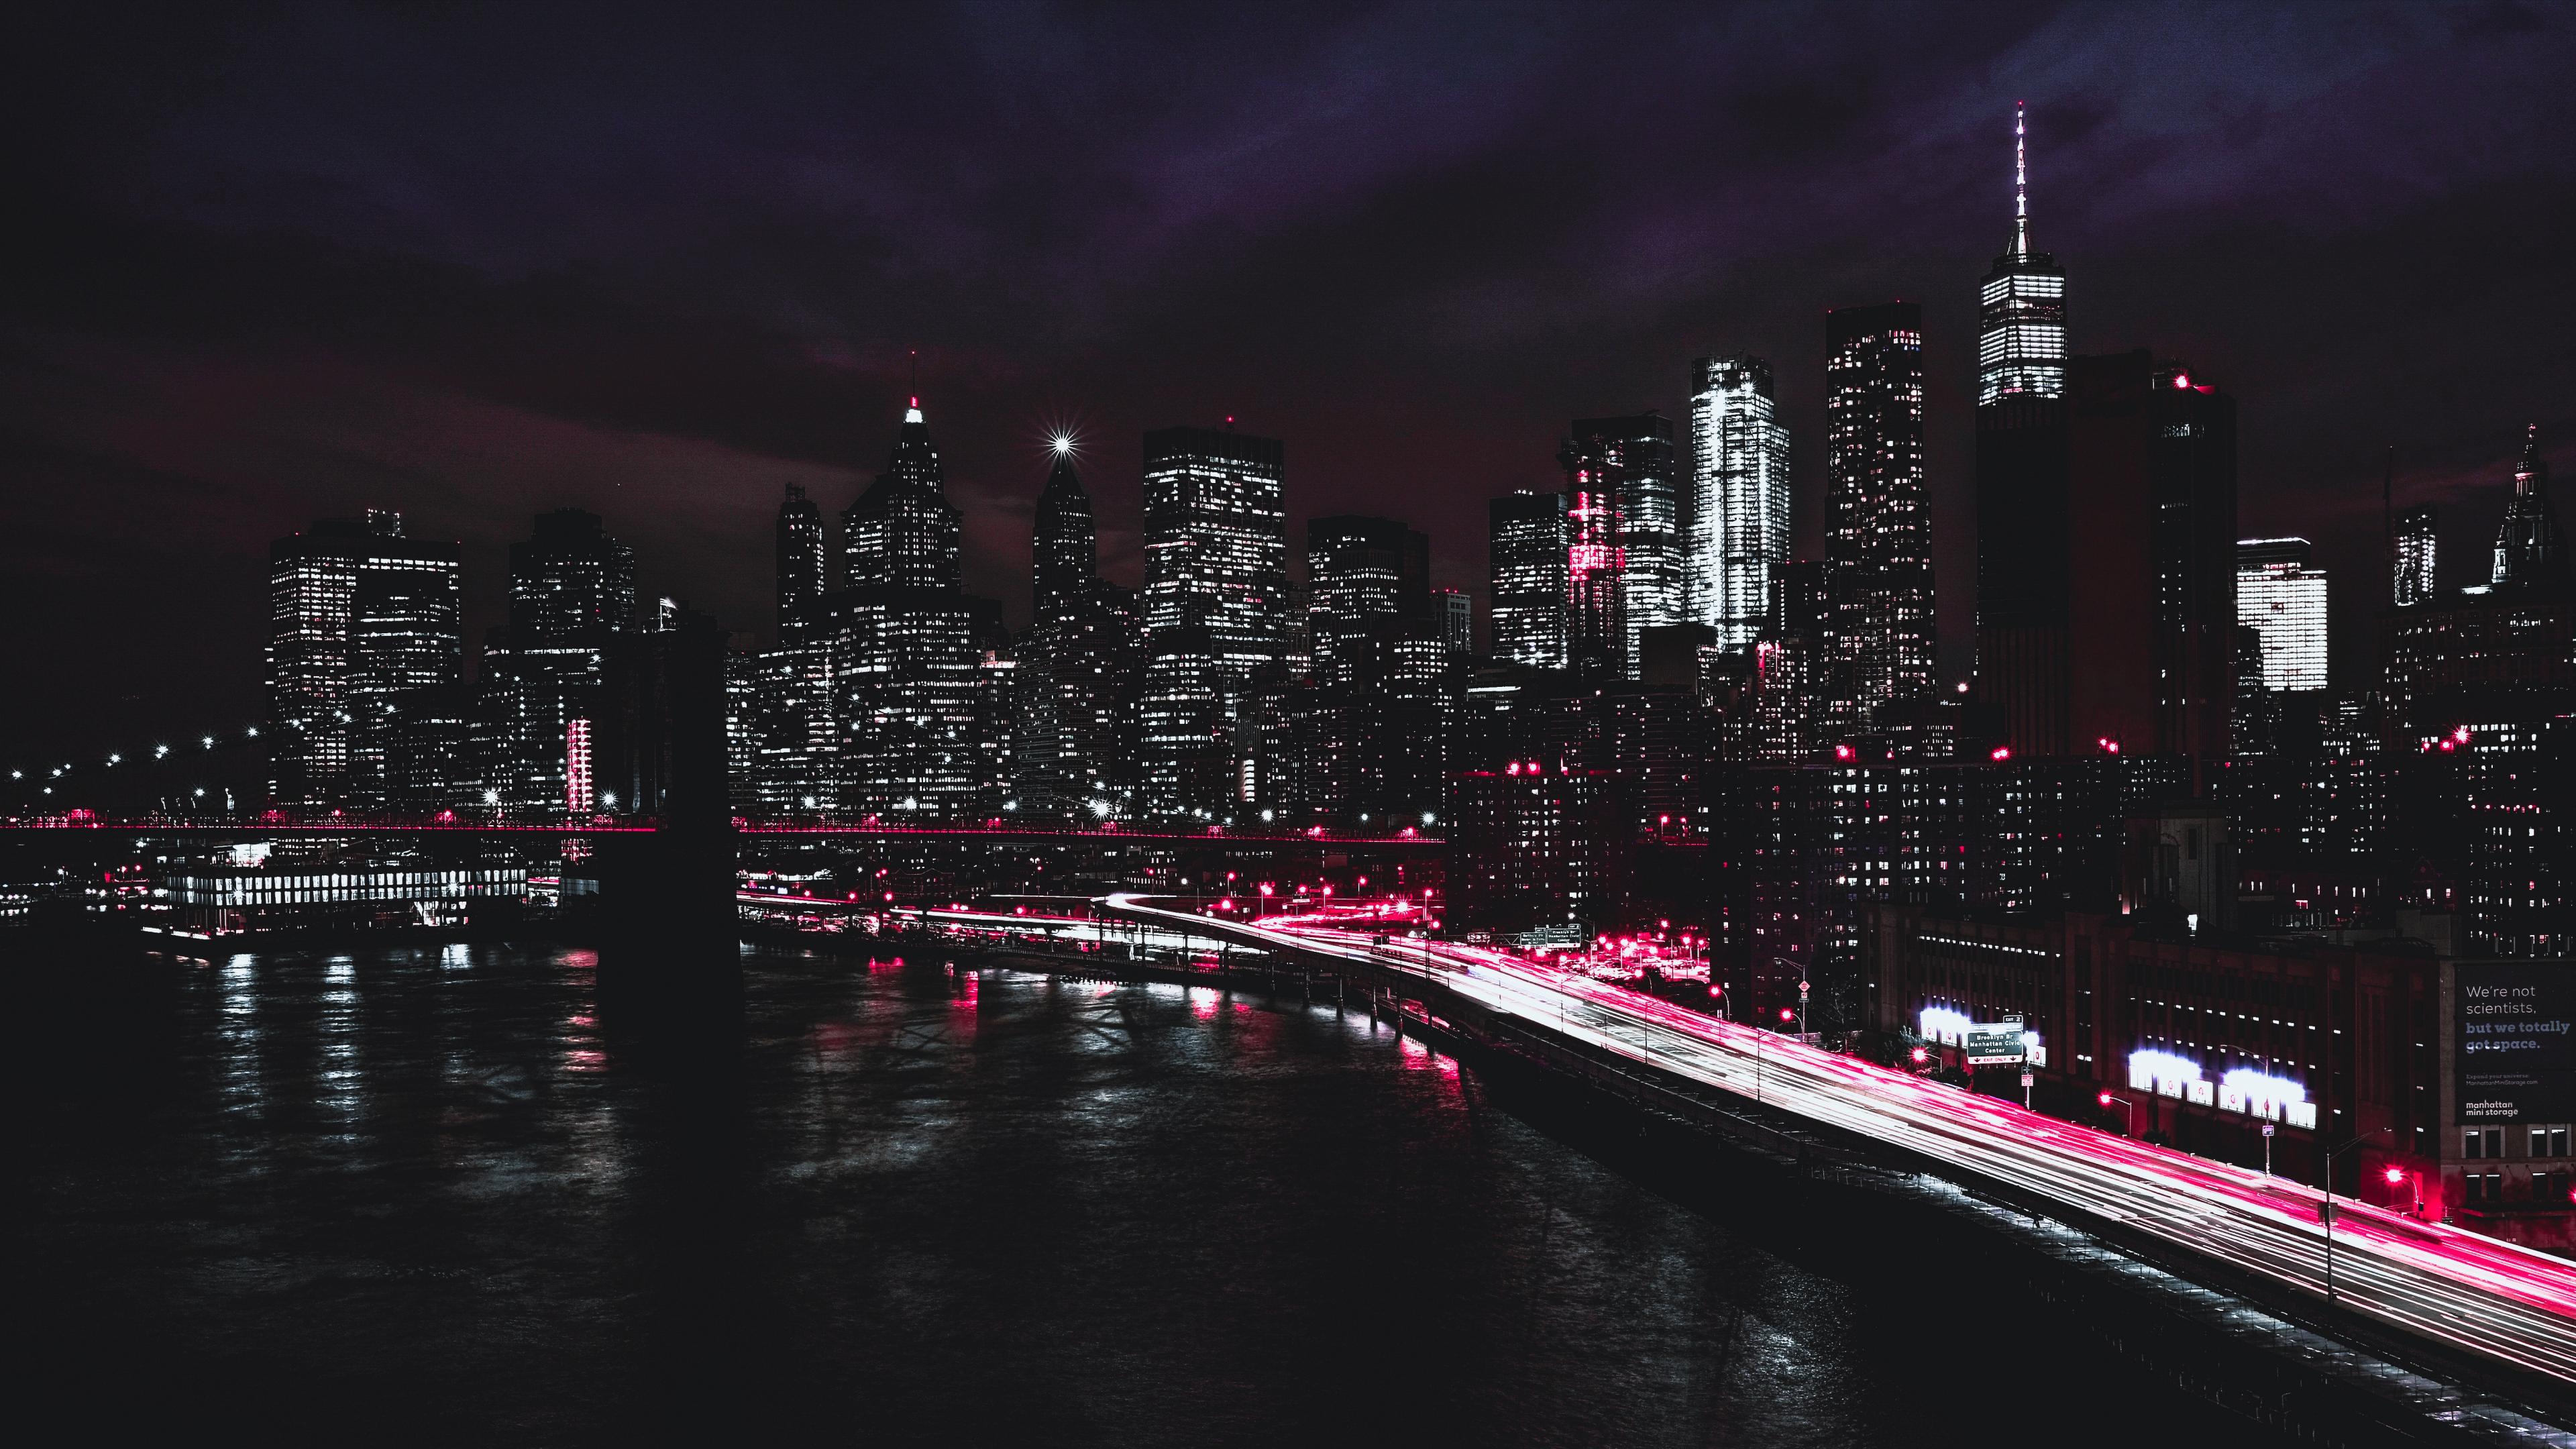 15 151517 wallpaper new york usa night skyscrapers desktop wallpapers